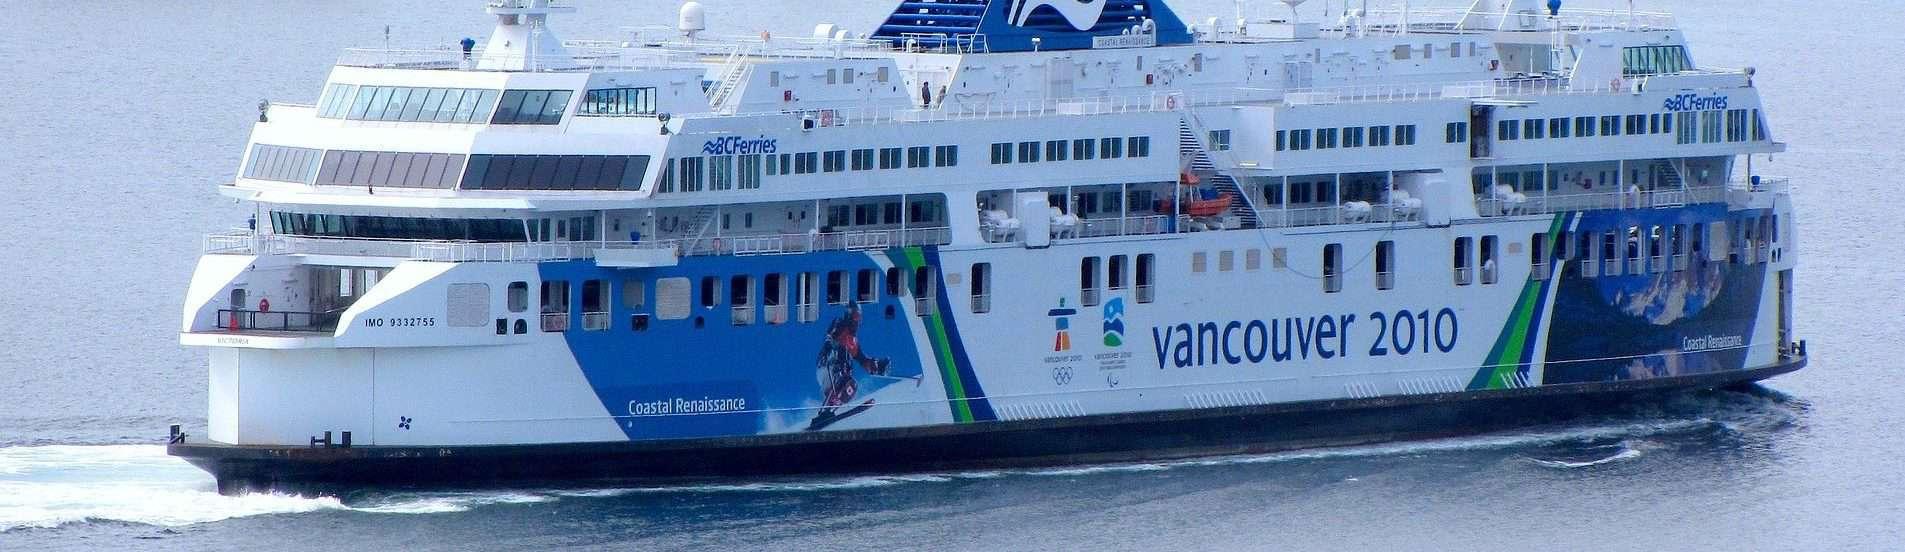 bc-ferries-2010